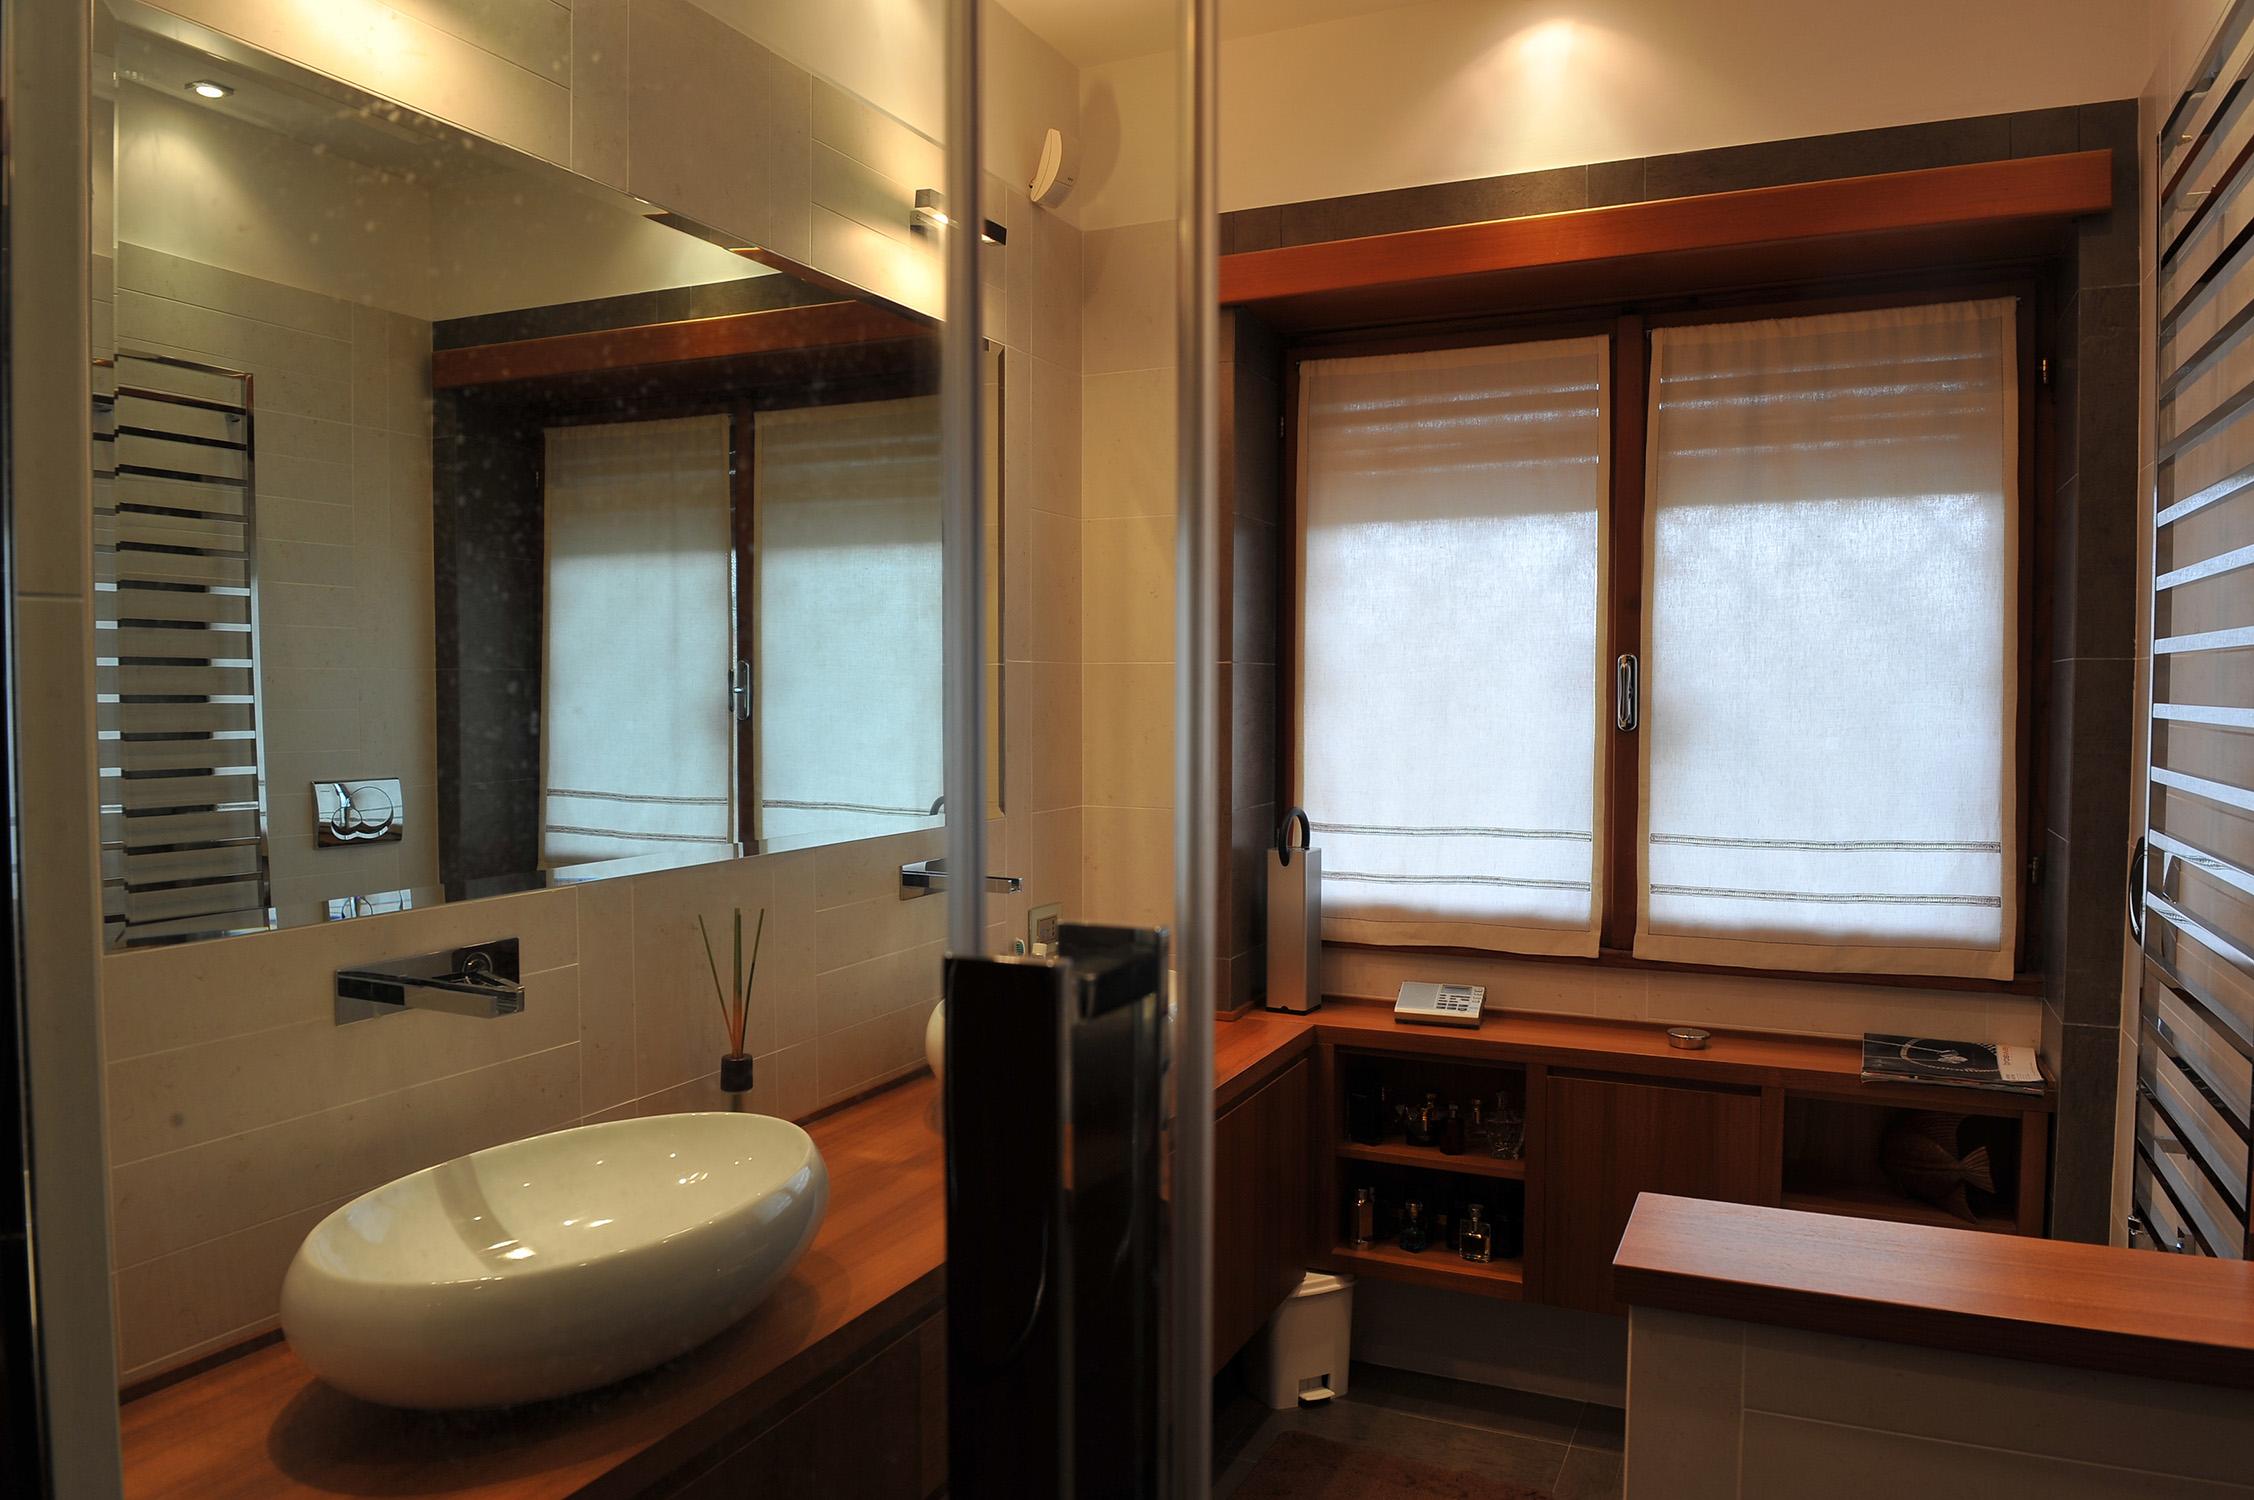 Arbi arredobagno arredo bagno e lavanderia made in italy